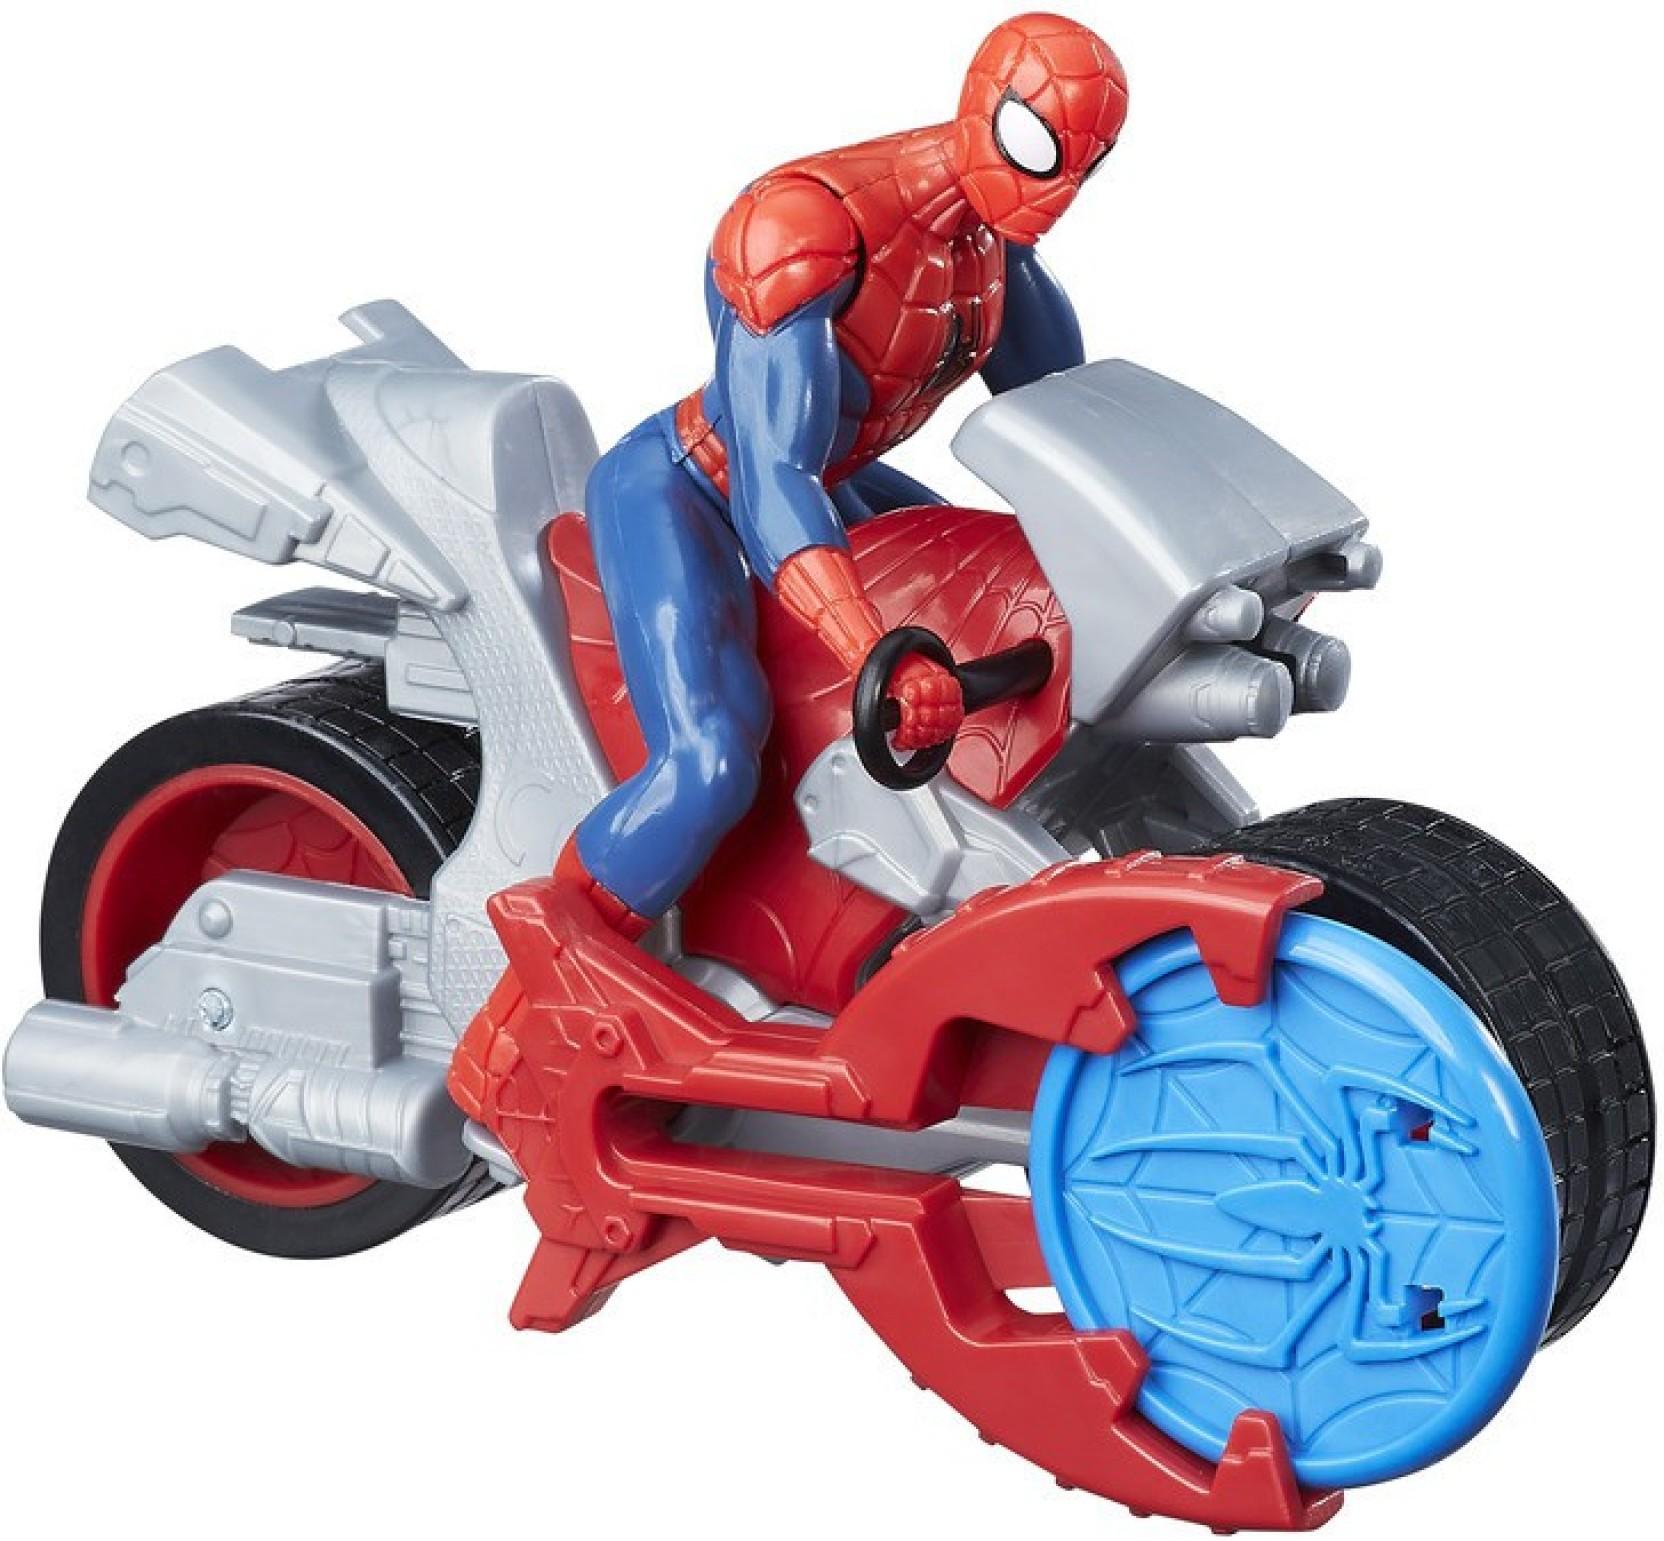 Marvel Spider-Man Blast n Go - Spider-Man Blast n Go . Buy Spiderman ... 3ce9d61a6